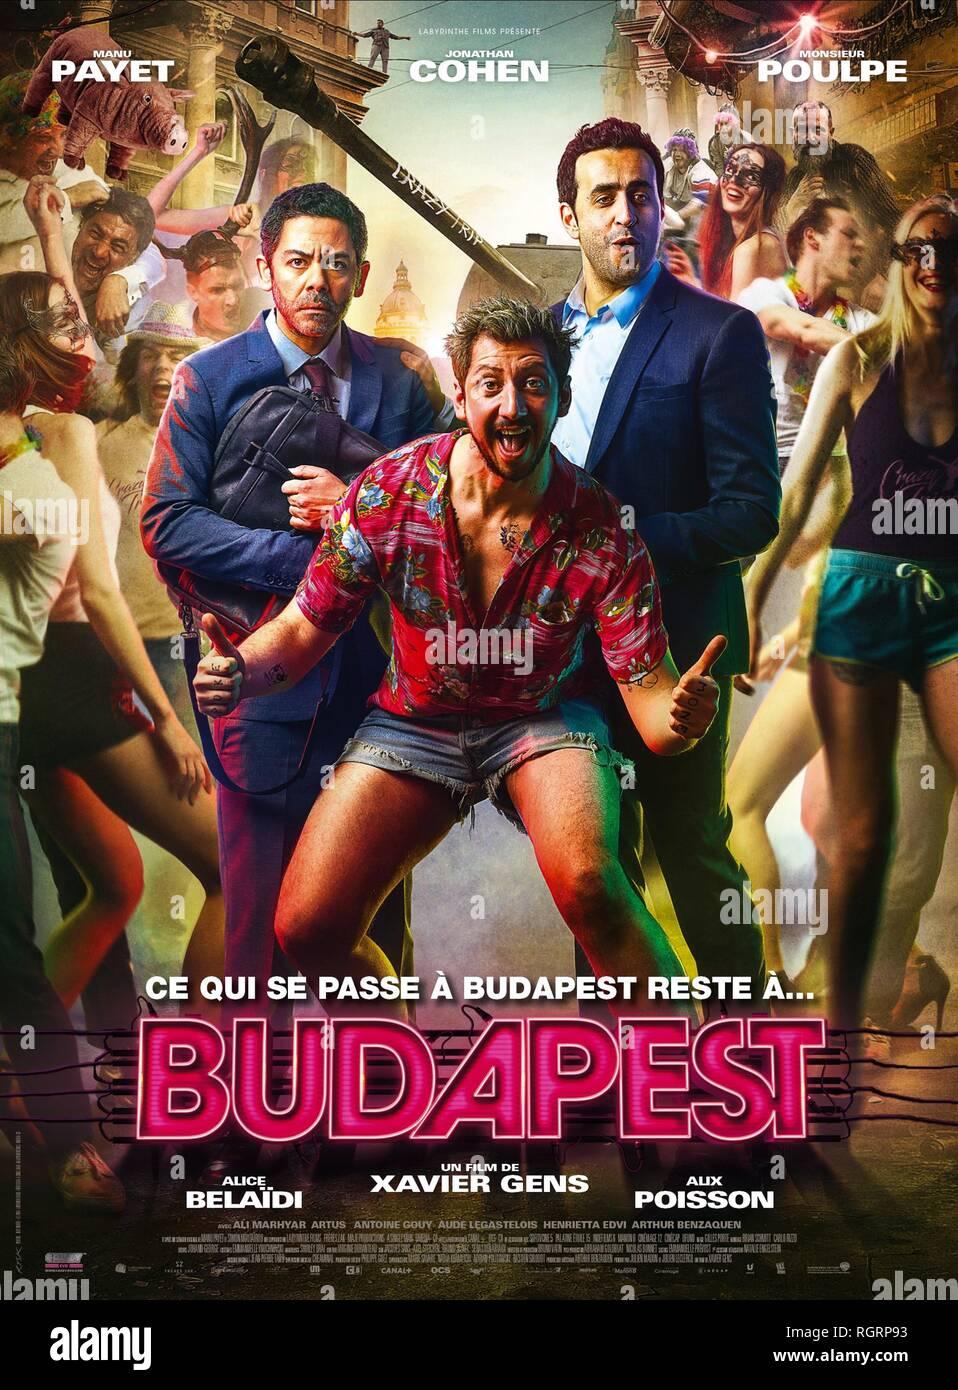 Le Poulpe (film) : poulpe, (film), PAYET,, MONSIEUR, POULPE,, JONATHAN, COHEN, POSTER,, BUDAPEST,, Stock, Photo, Alamy